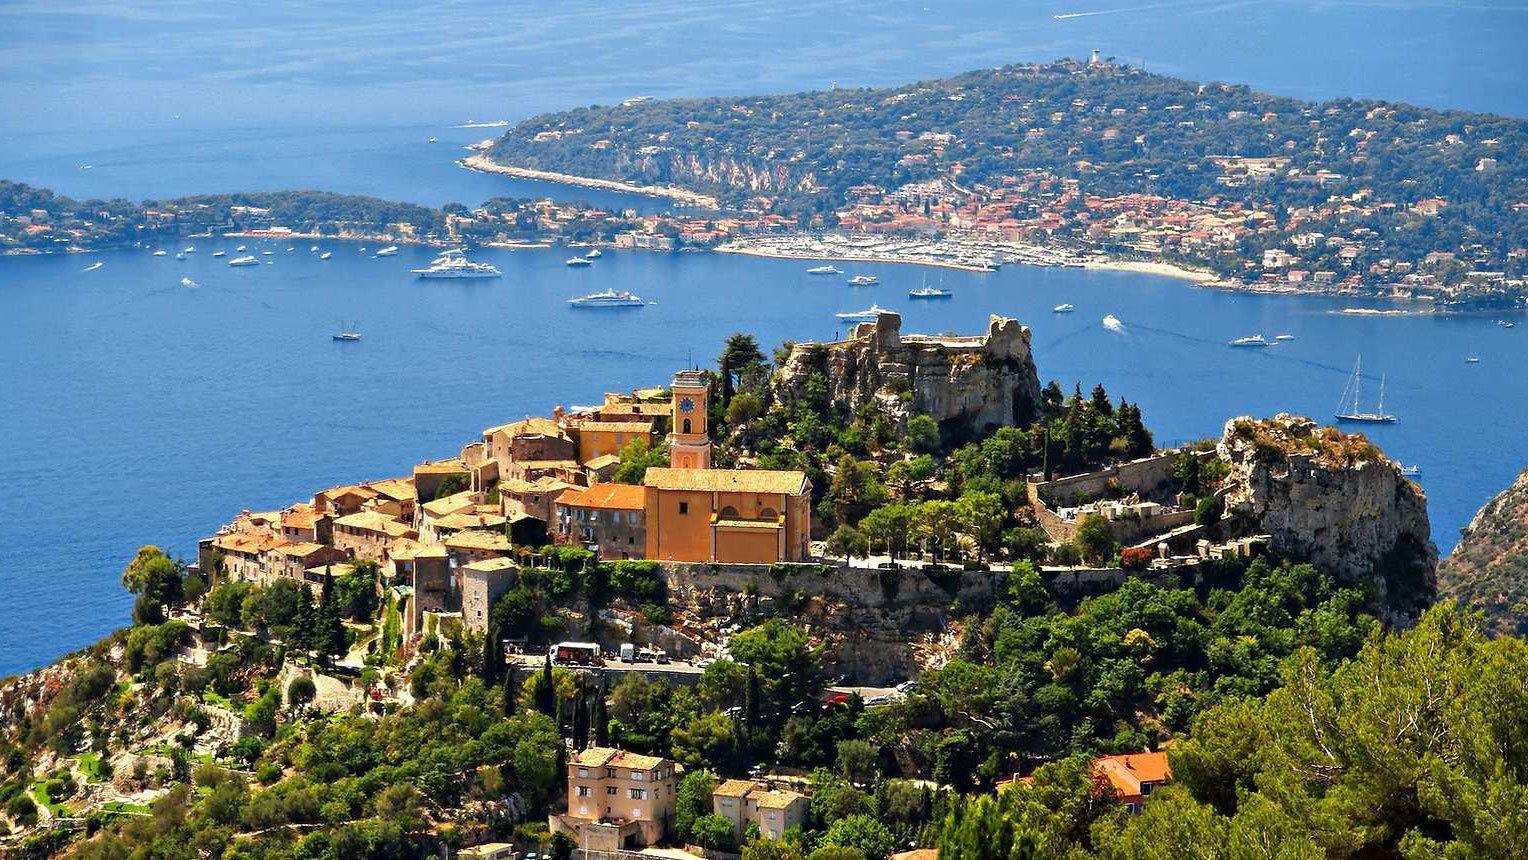 Day view overlooking Monaco